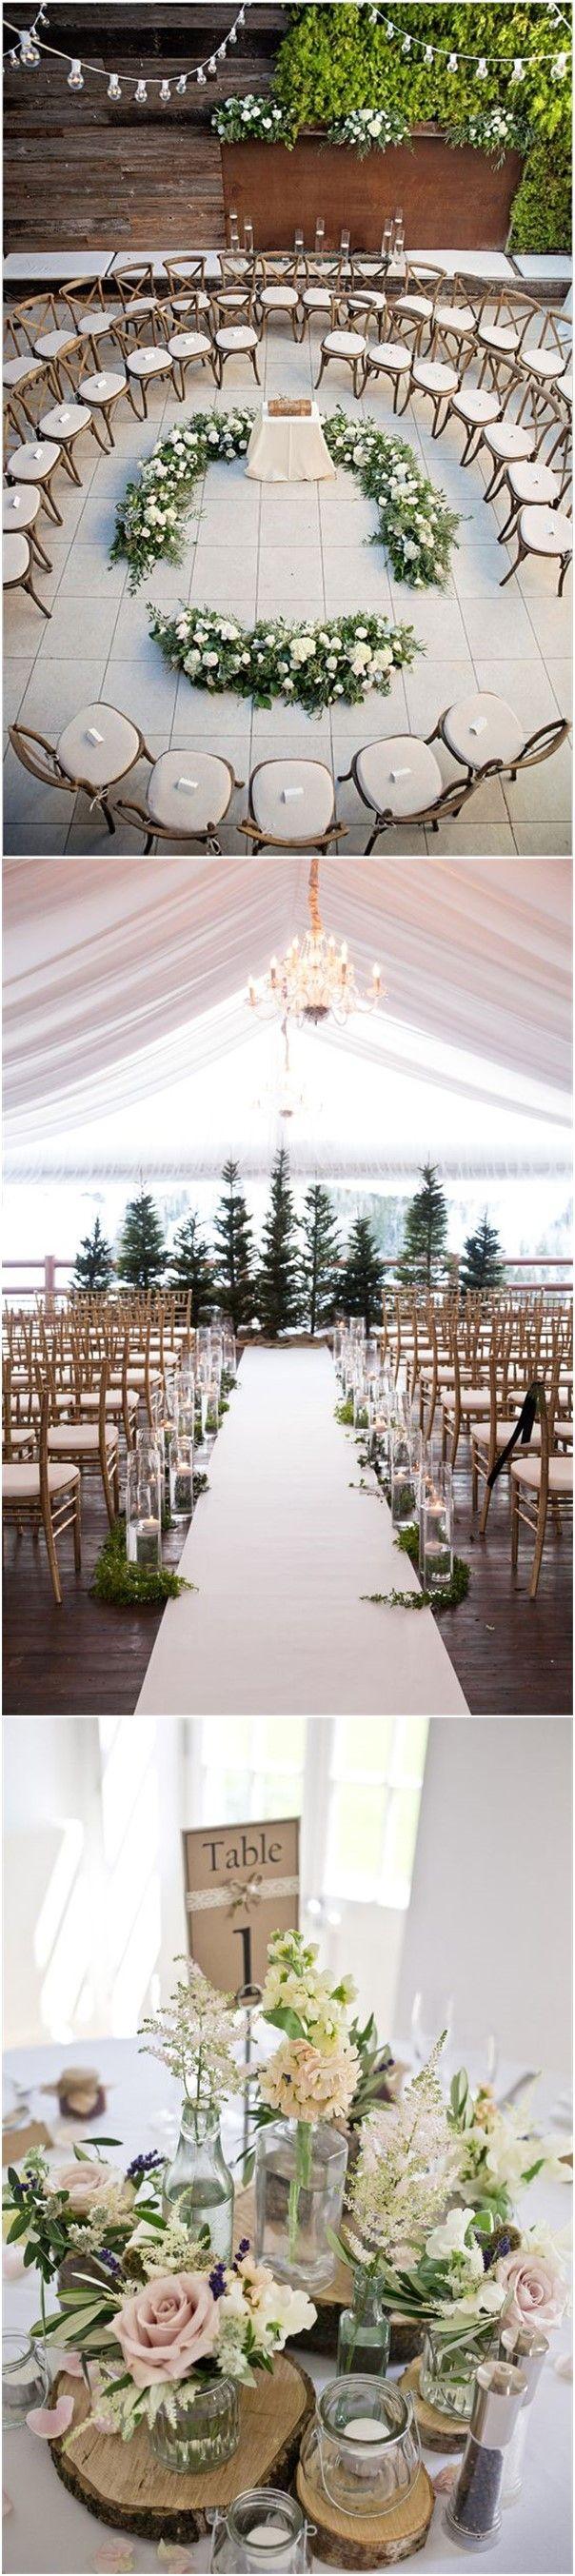 82 best Wedding Ideas images on Pinterest | Weddings, Dream wedding ...